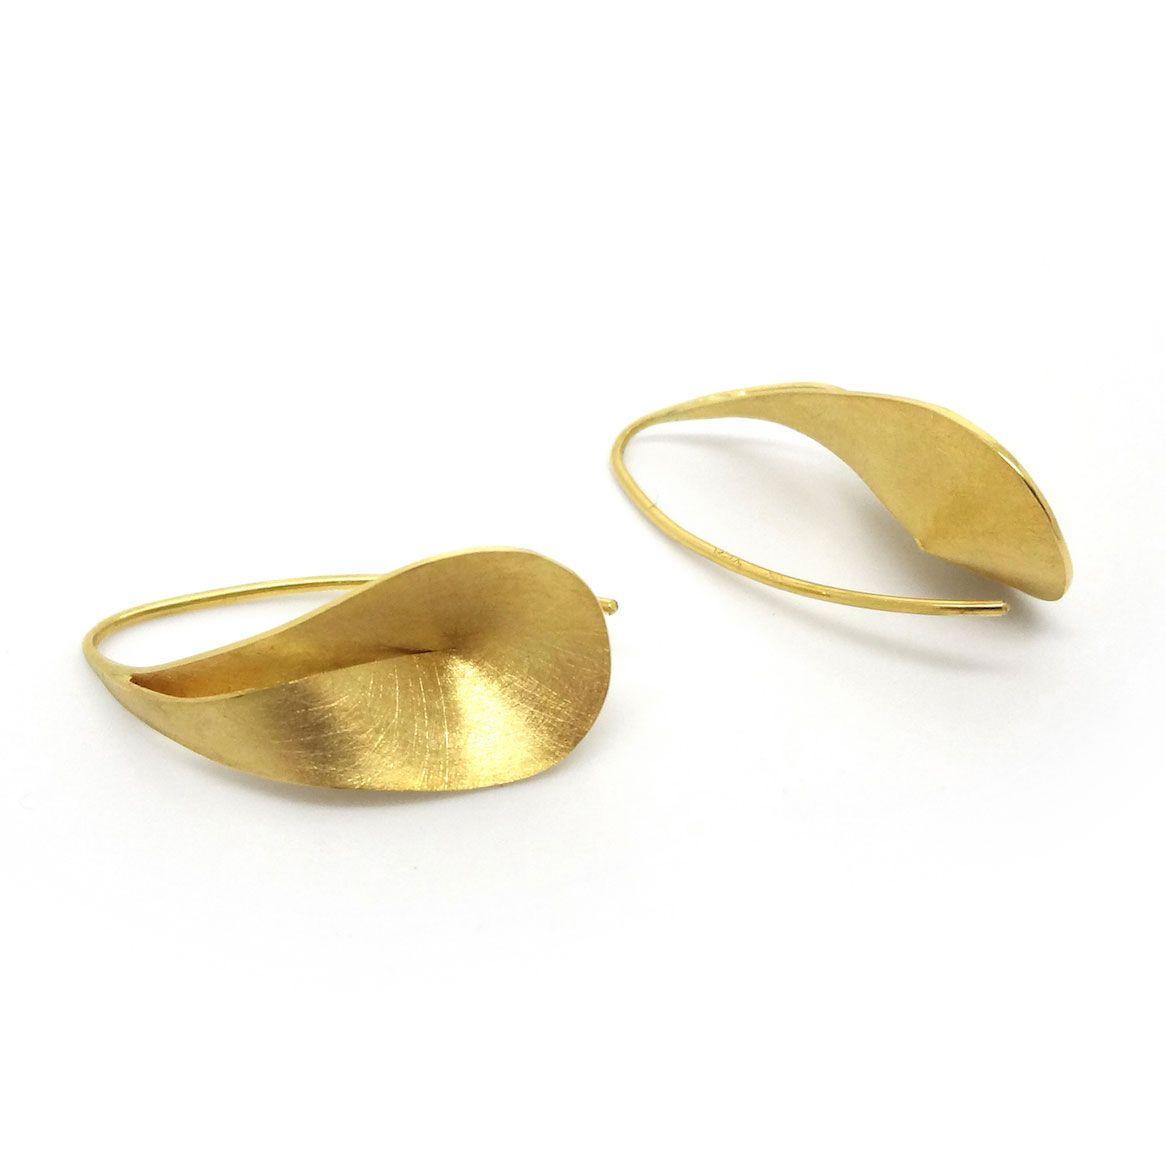 8b302d5e0 ORRO.co.uk - Atelier Luz – Gold Volute Earrings - ORRO Contemporary  Jewellery Glasgow.